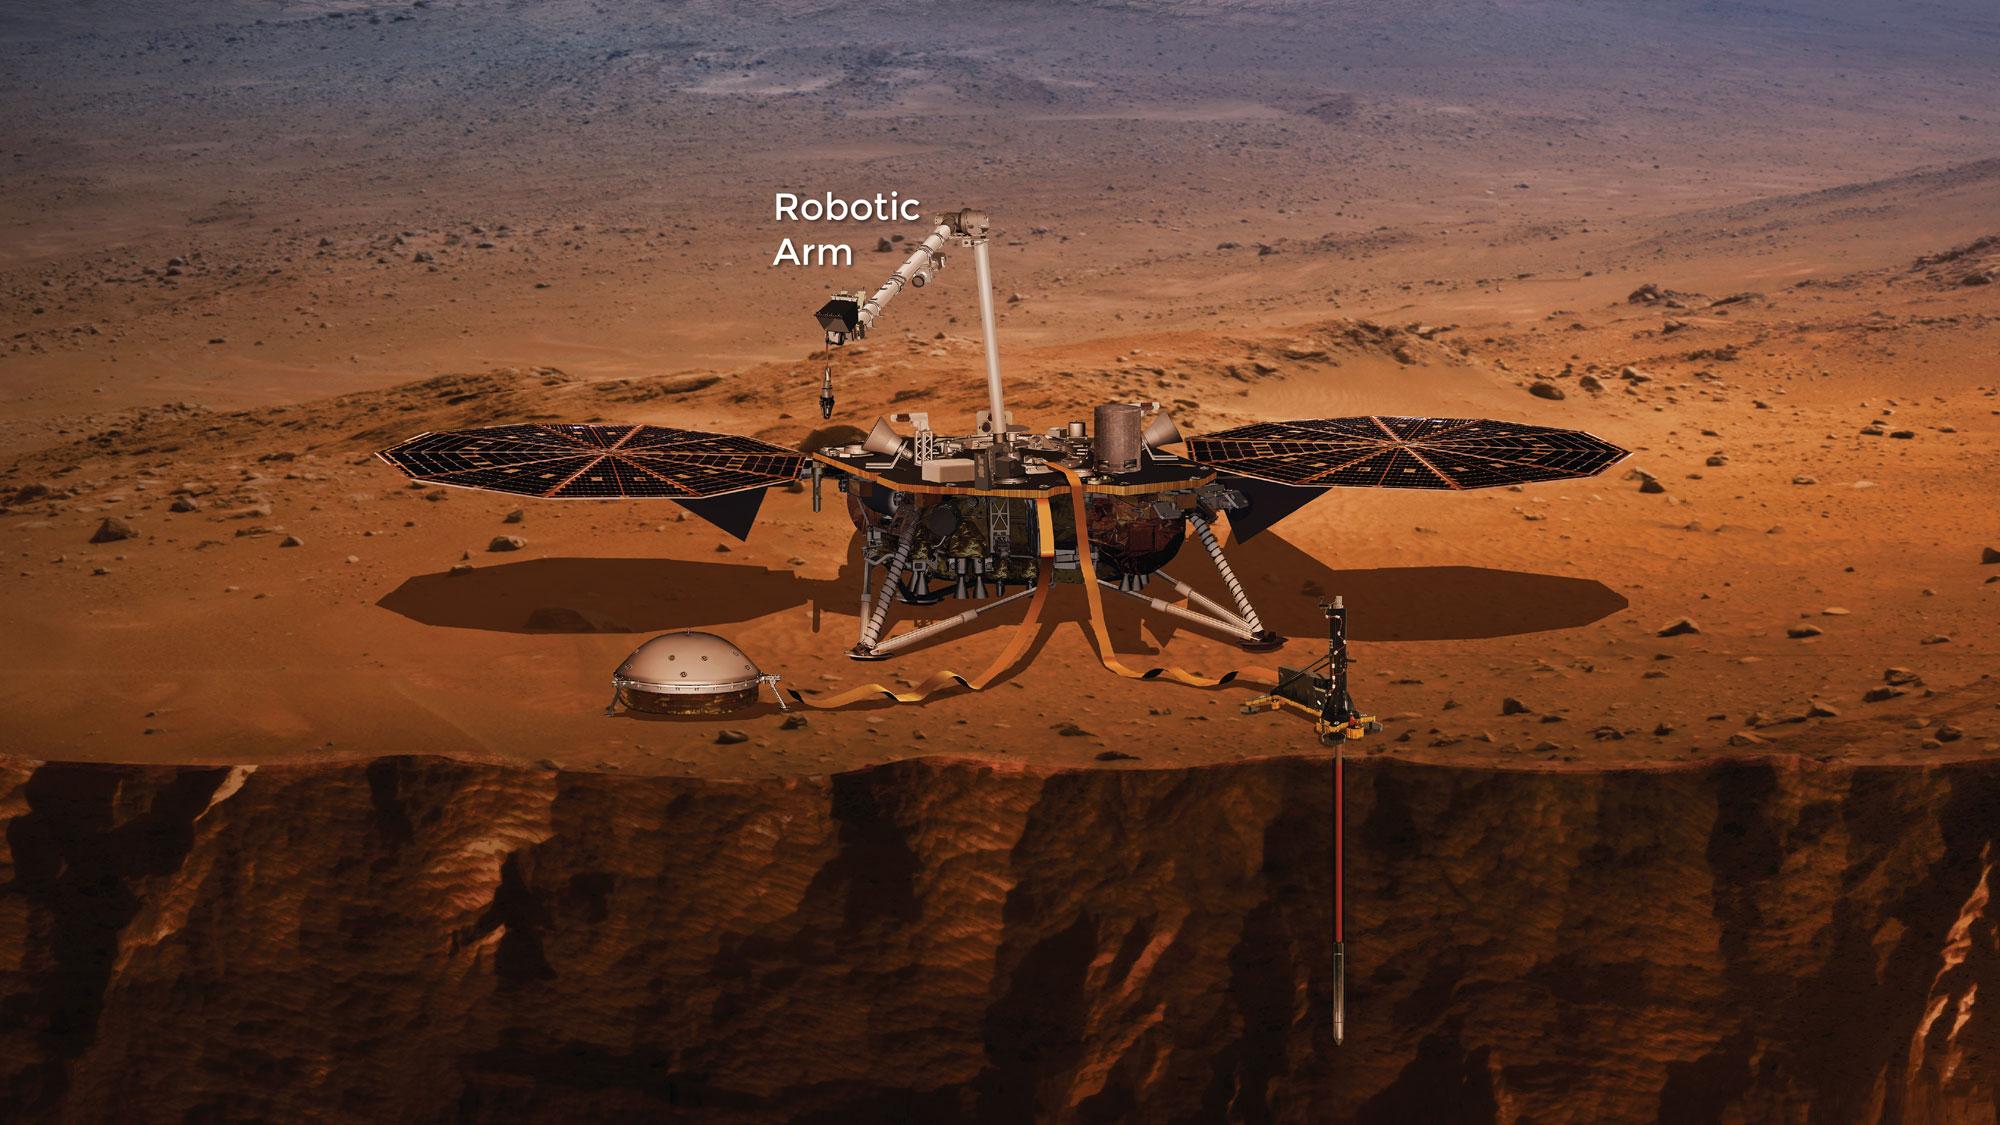 About the Lander   Spacecraft – NASA's InSight Mars Lander